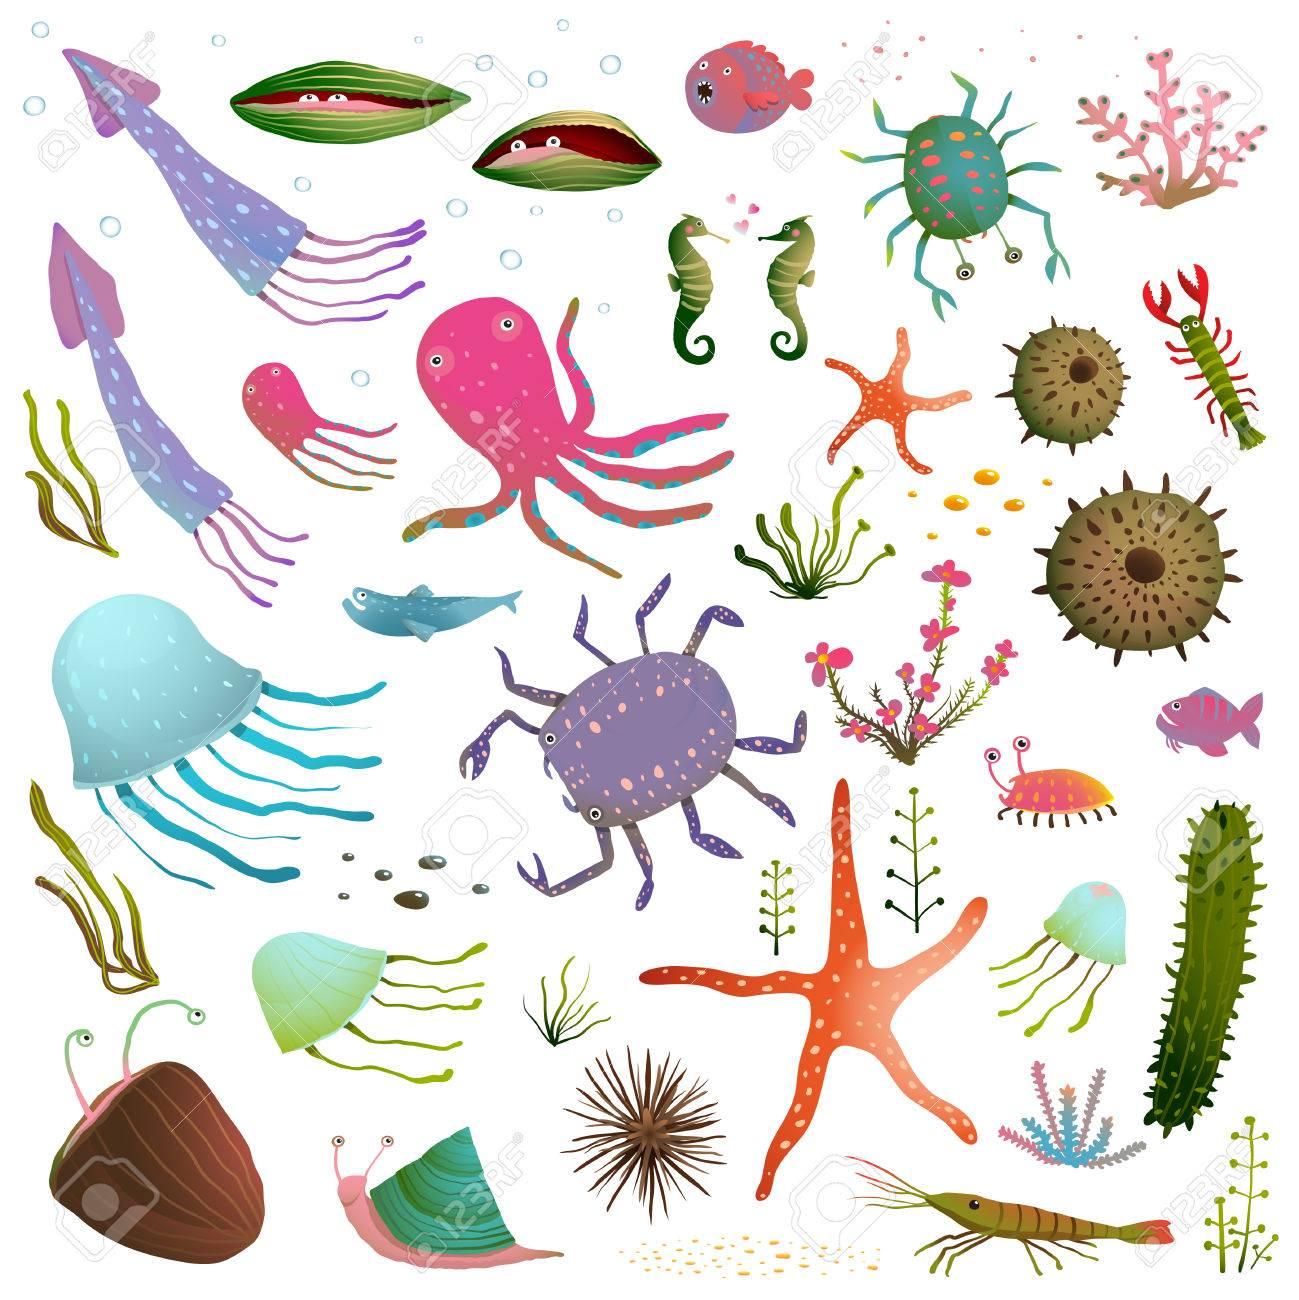 Colorful Sea Life Animals Isolated on White Cartoon Clip Art...